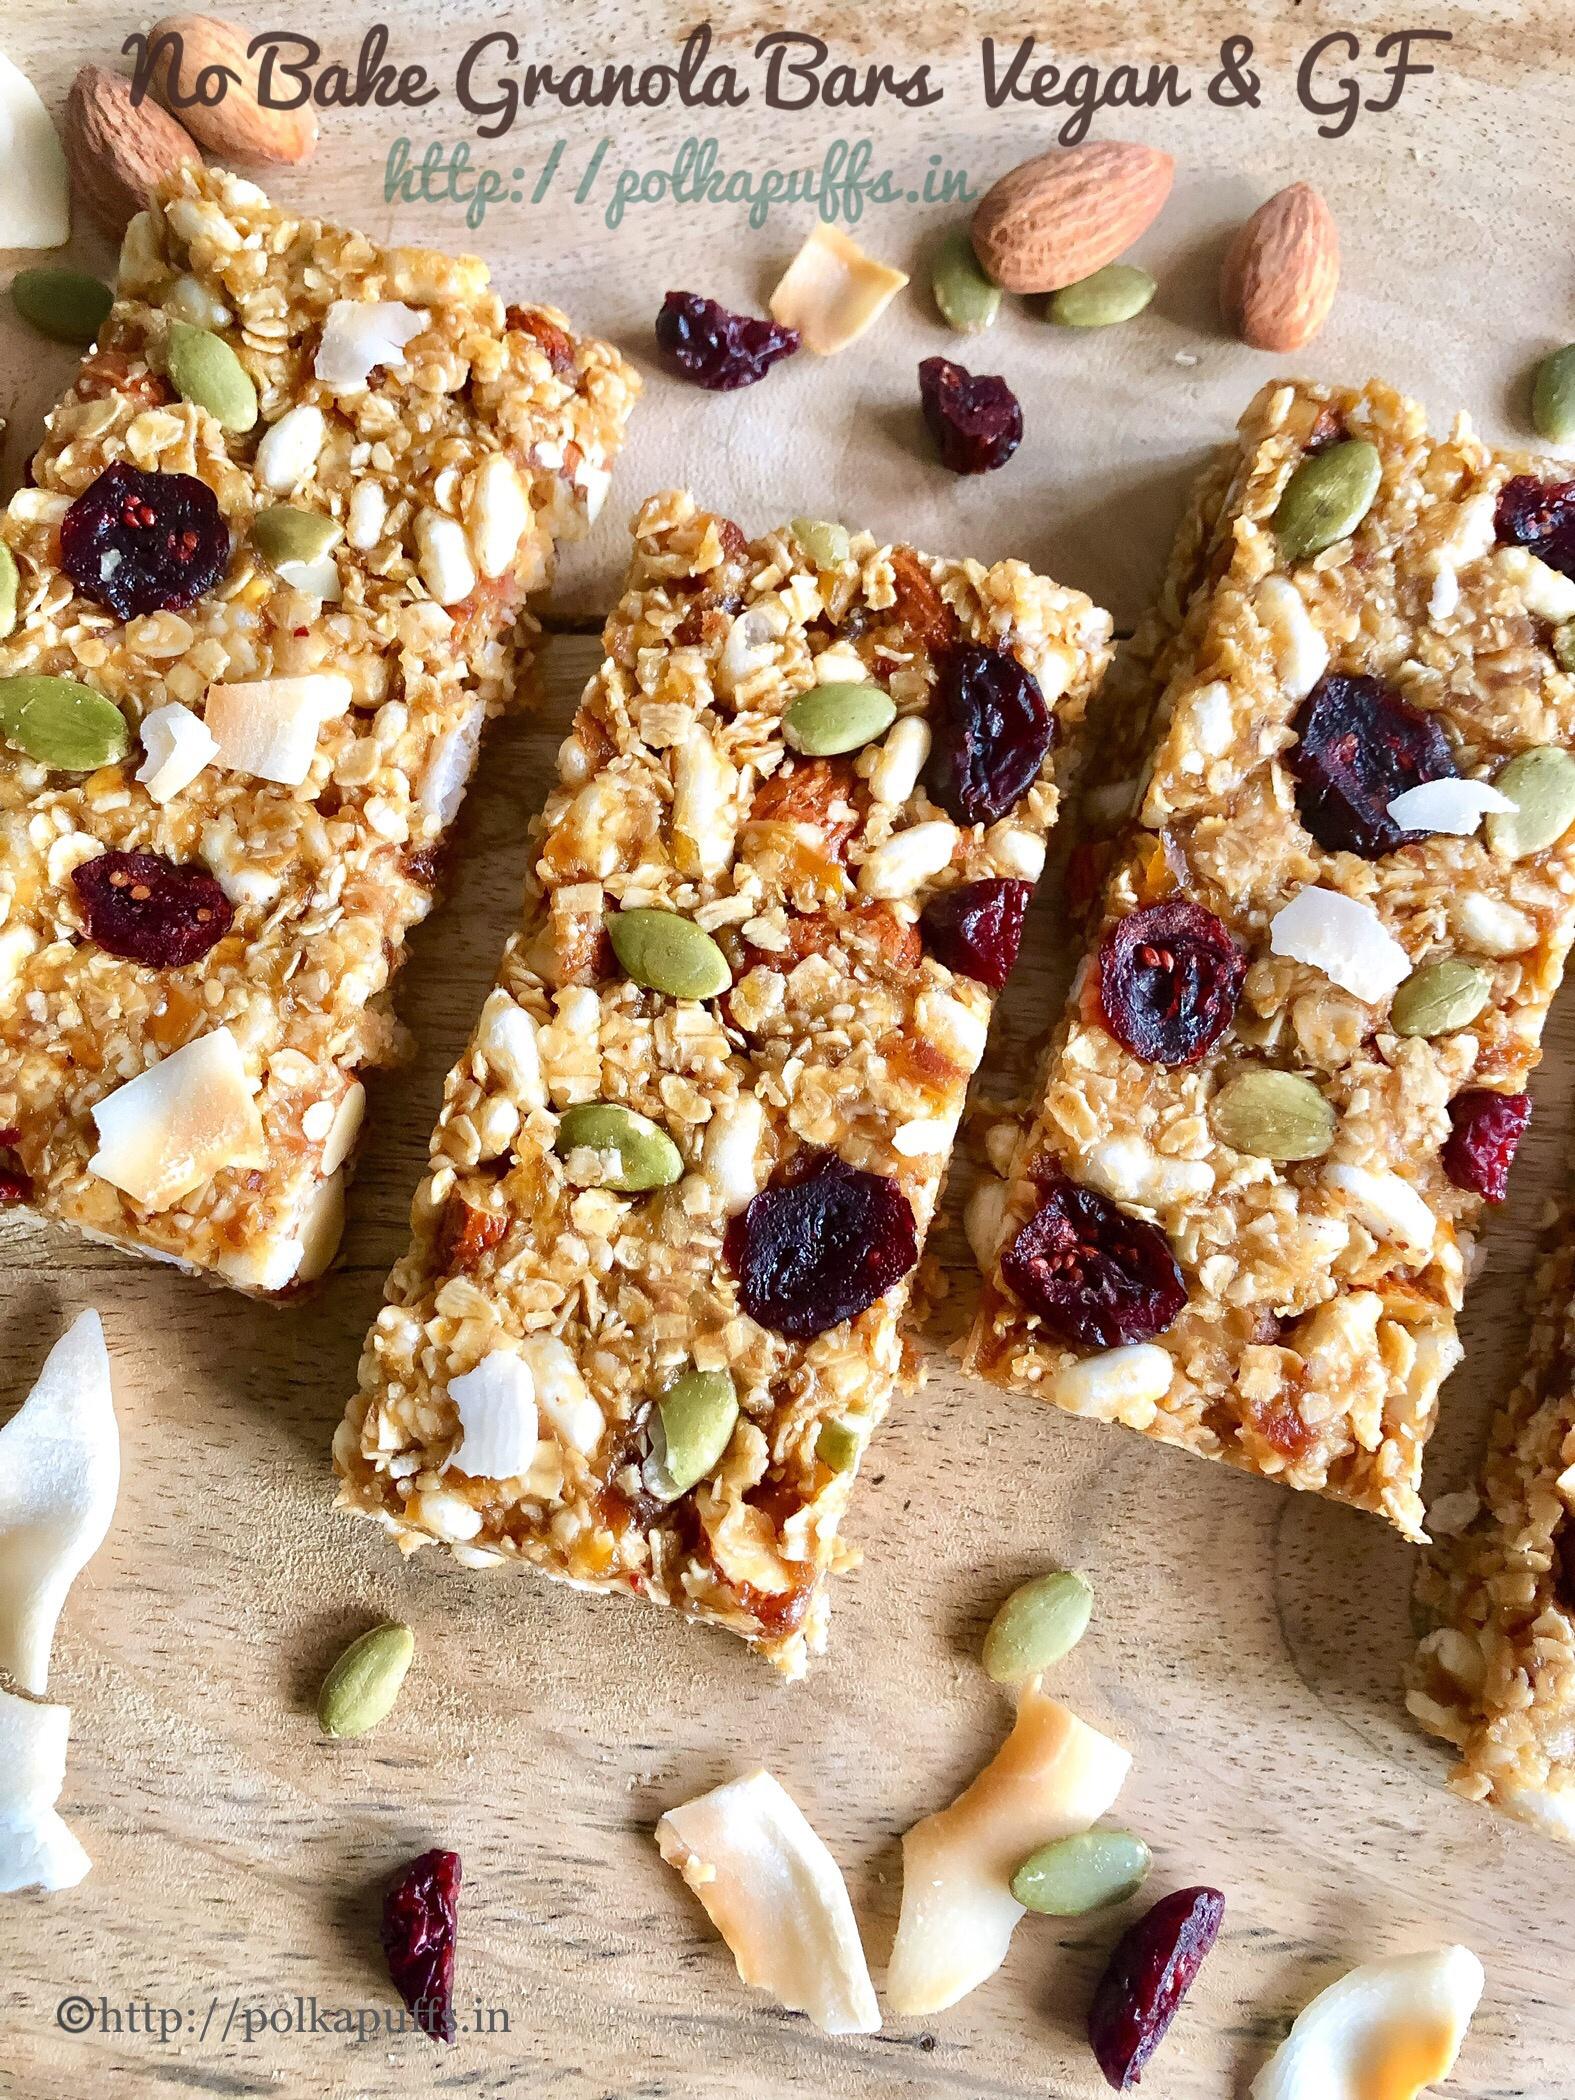 no bake granola bar V & GF pinterest